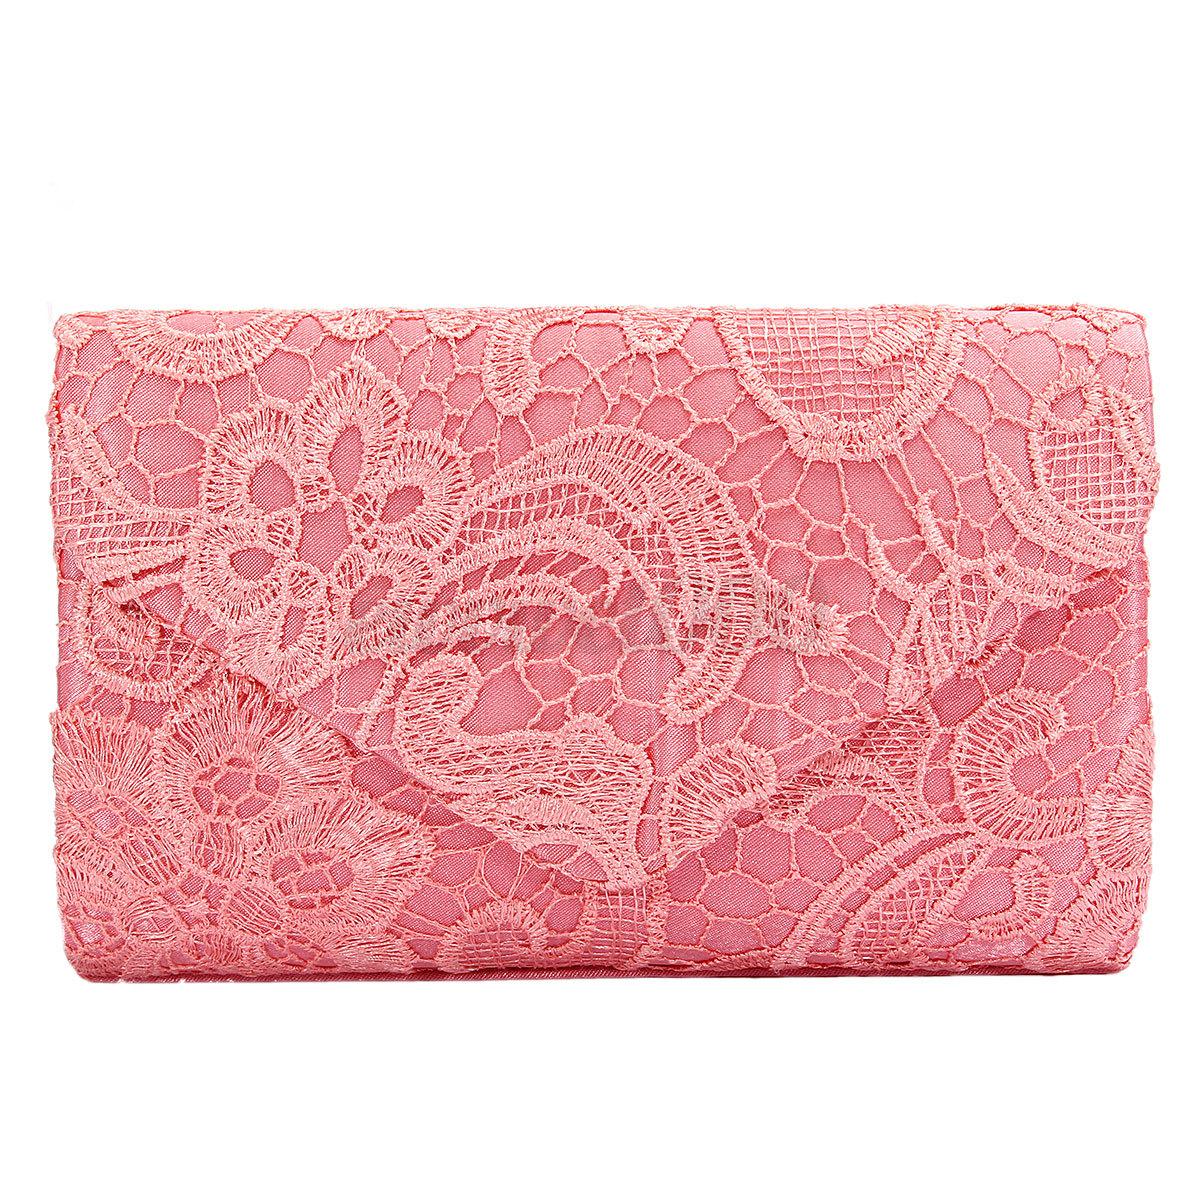 Womens Lady Lace Wedding Party Bridal Messenger Evening Bag Clutch Handbag Purse